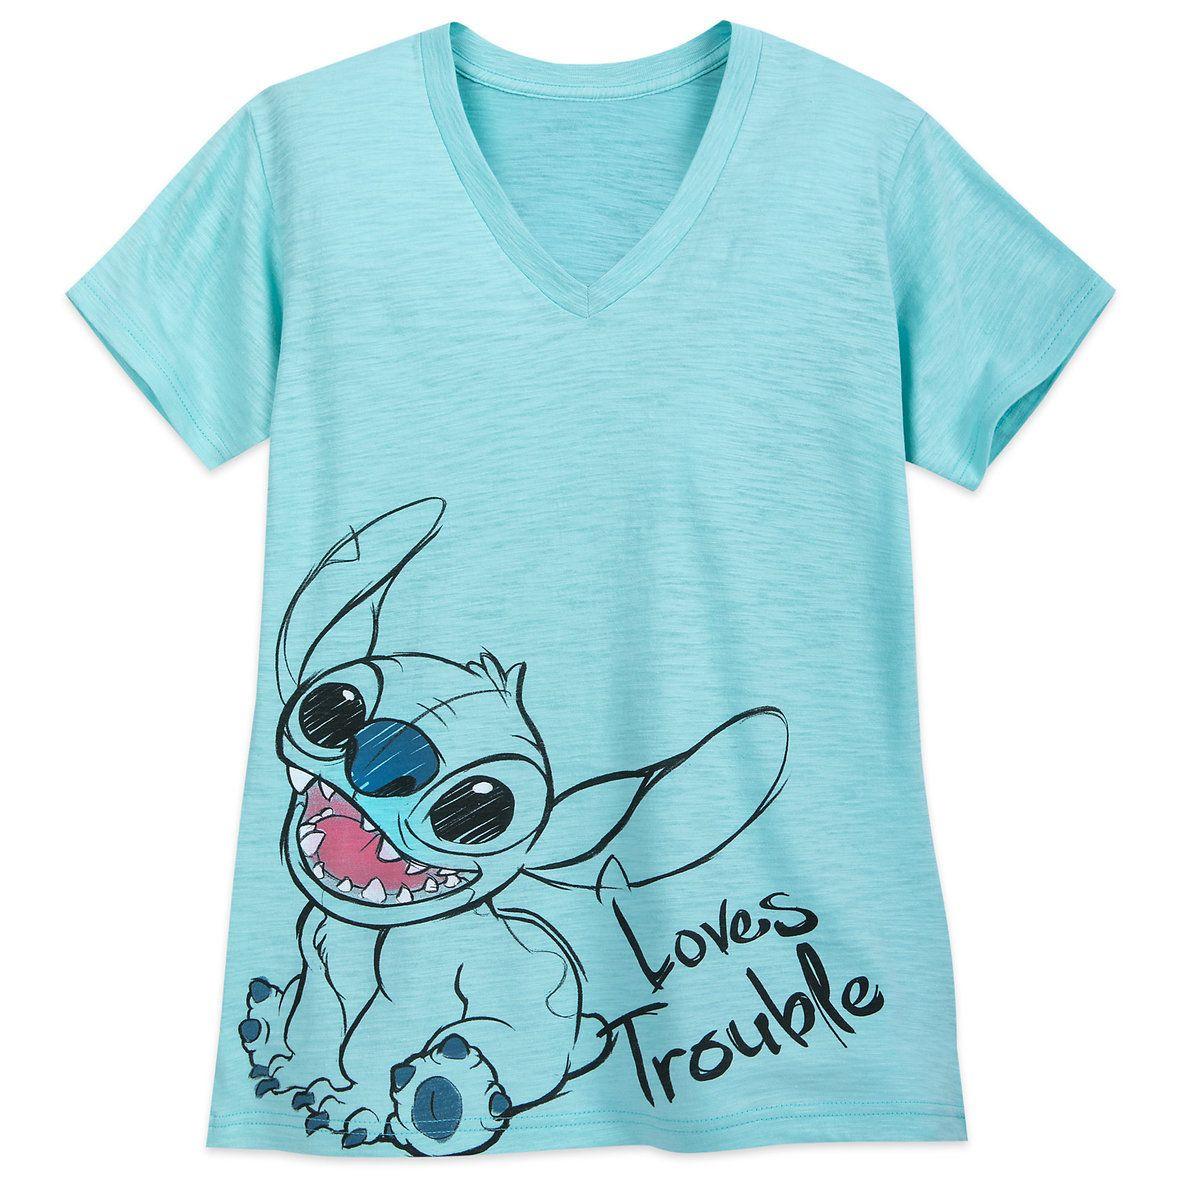 Thumbnail Image of Stitch V Neck T Shirt for Women # 1